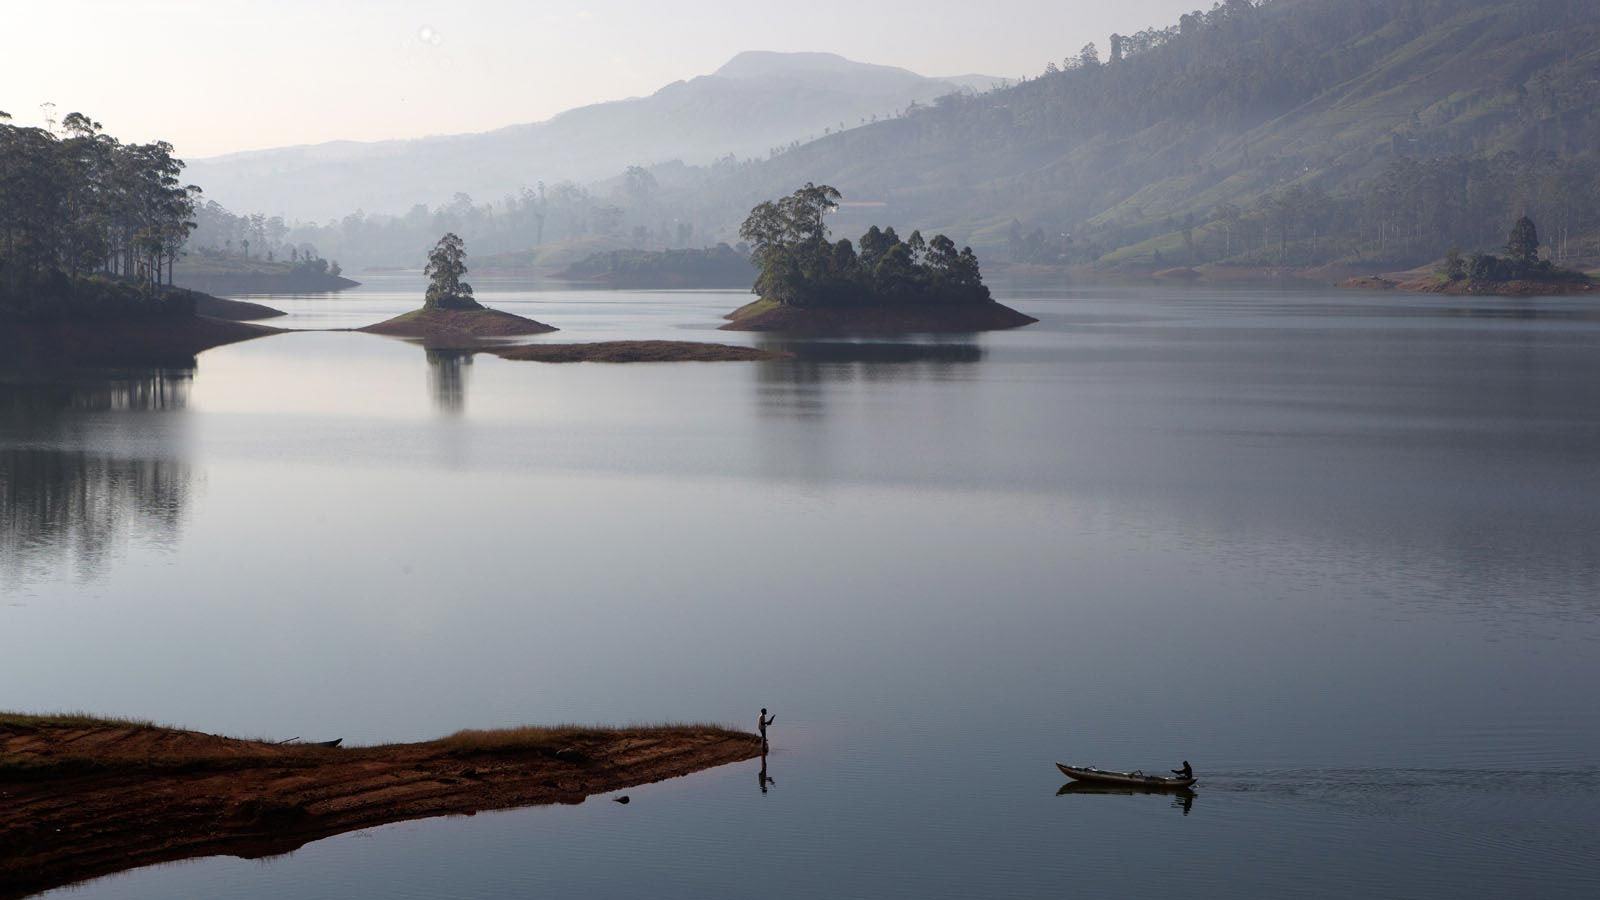 konyhasziget_ut_a_teahoz_castlereagh-lake-from-summerville-2.jpg